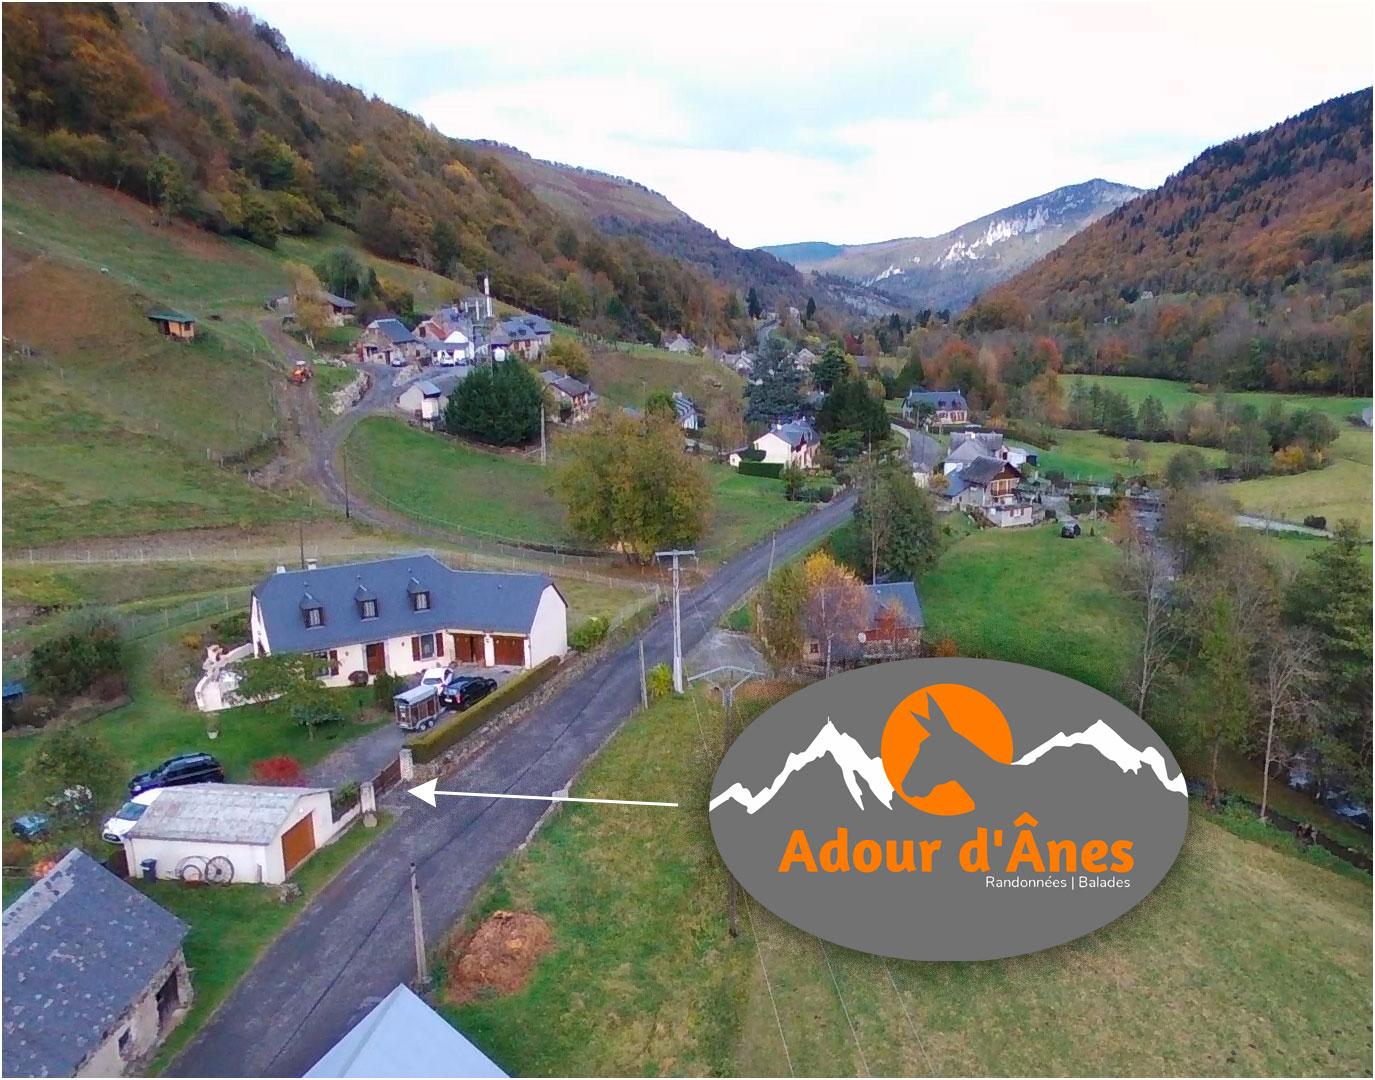 maison-adour-anes-pyrenees